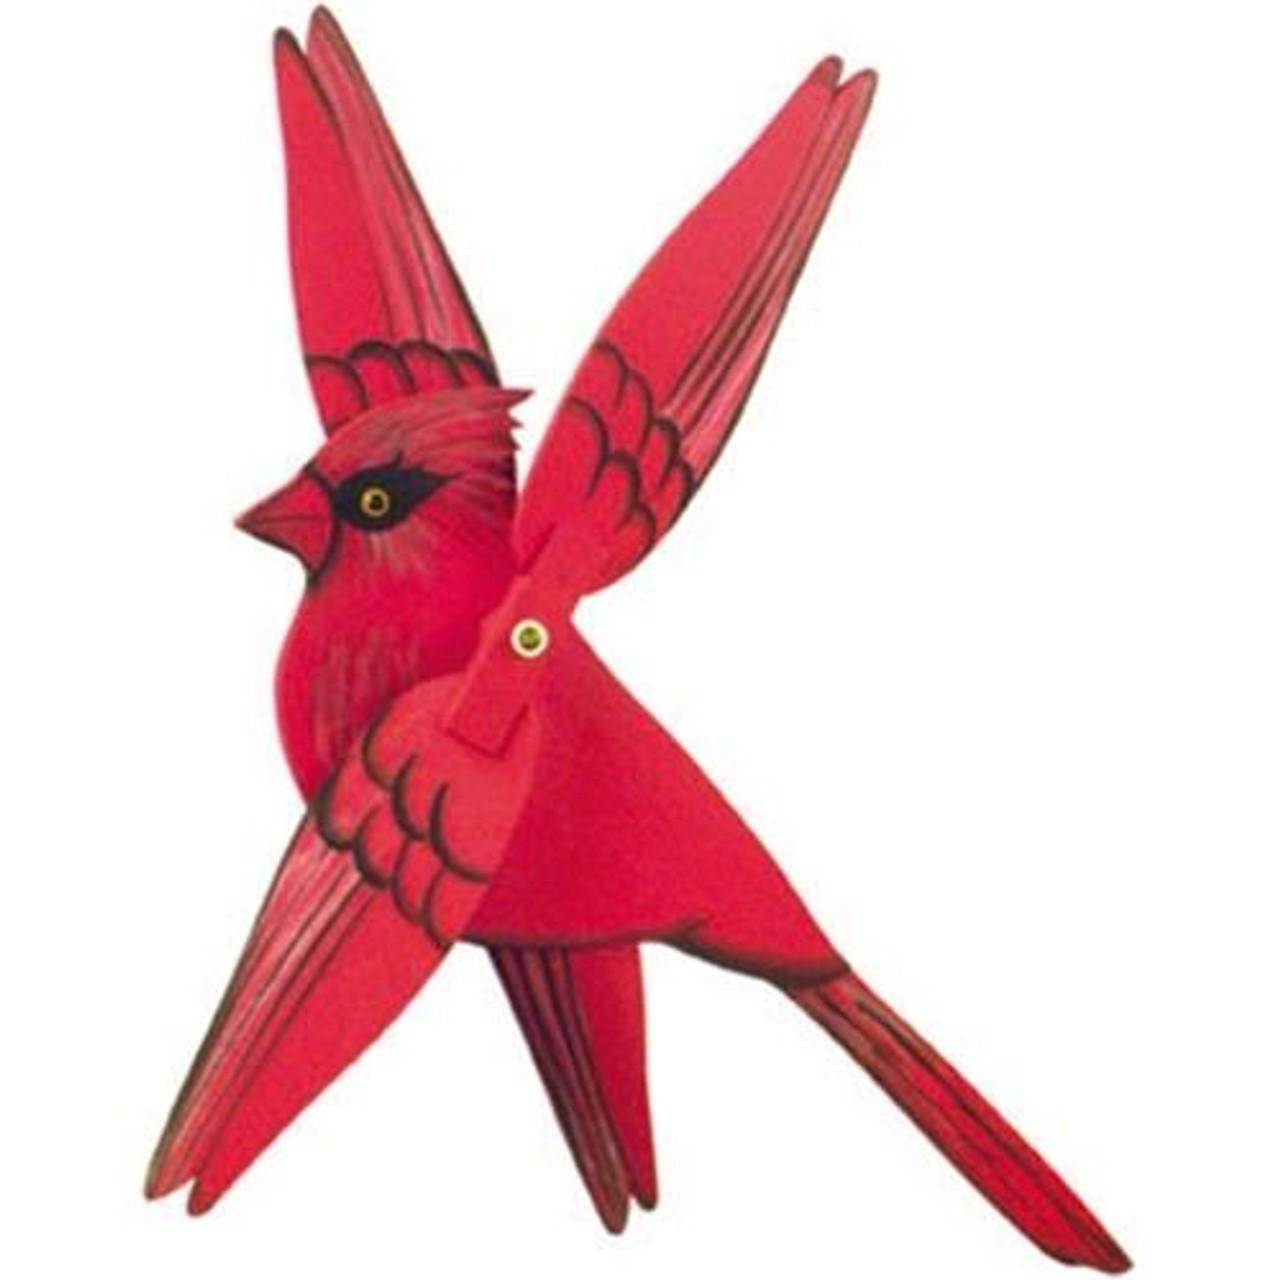 Cherry Tree Toys Male Cardinal Whirligig Hardware Kit